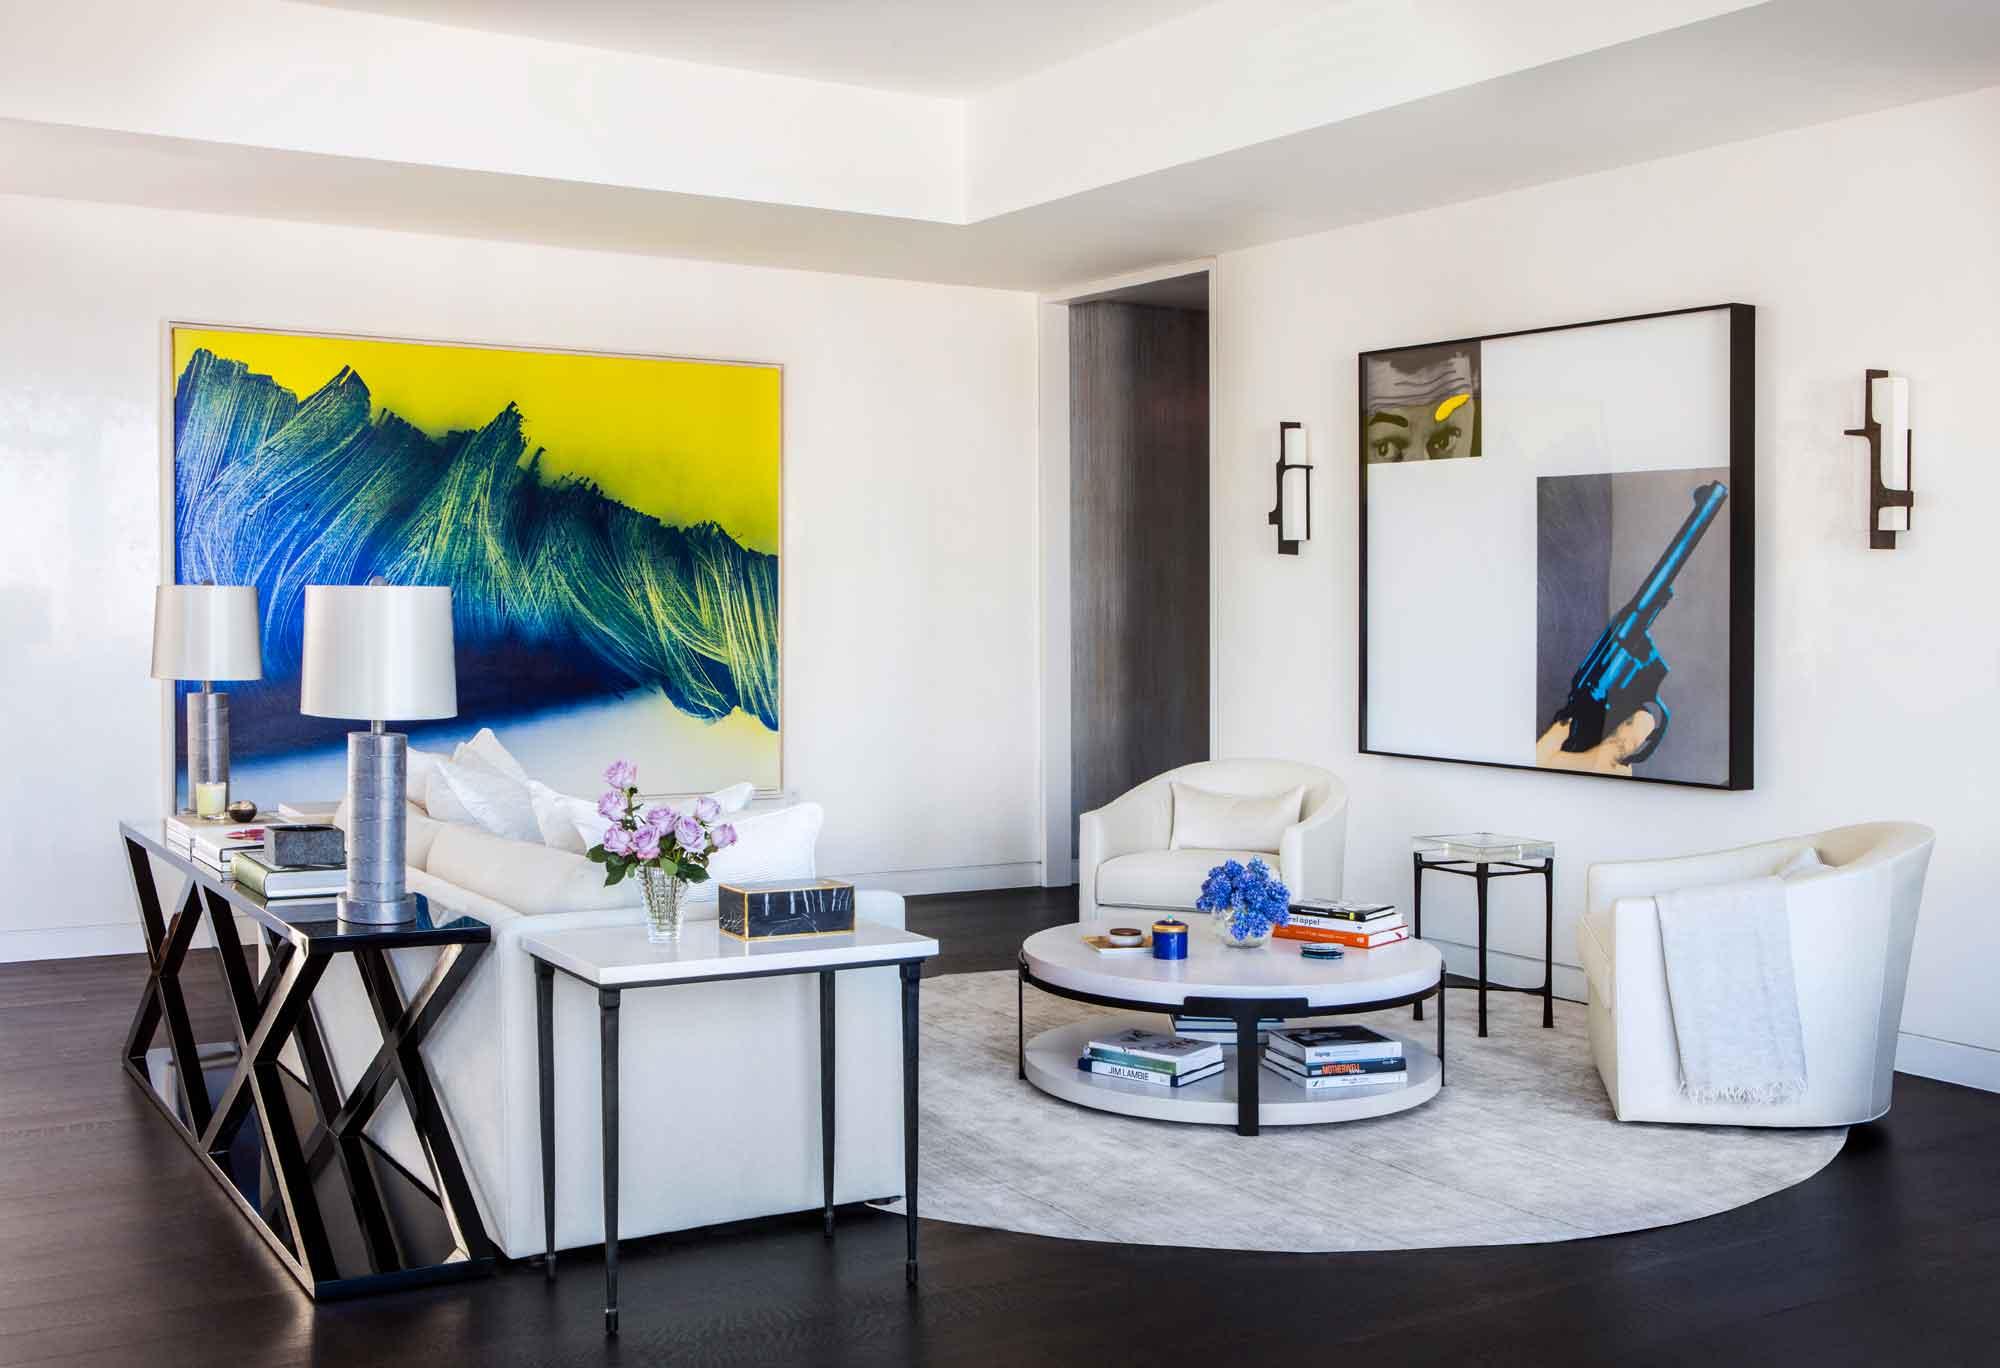 bacarat-living-room-nicole-fuller-2